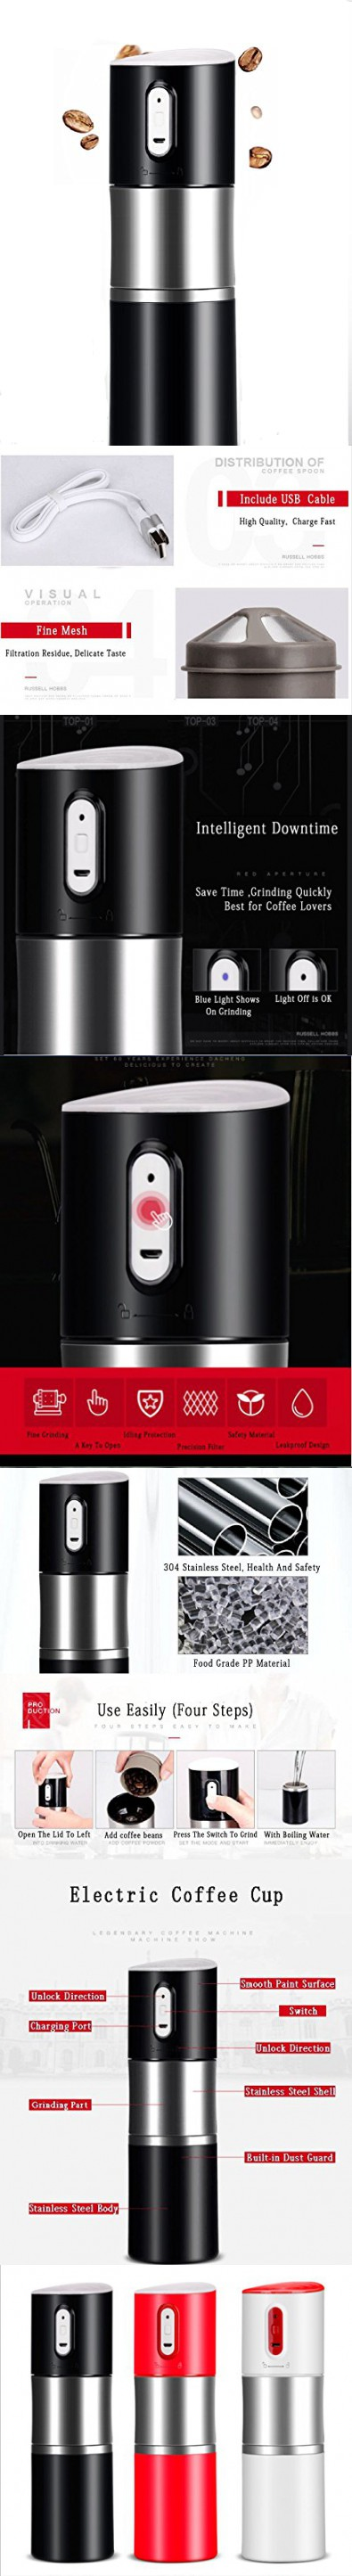 Portable Coffee Grinder/Mini Espresso Coffee Maker Grind